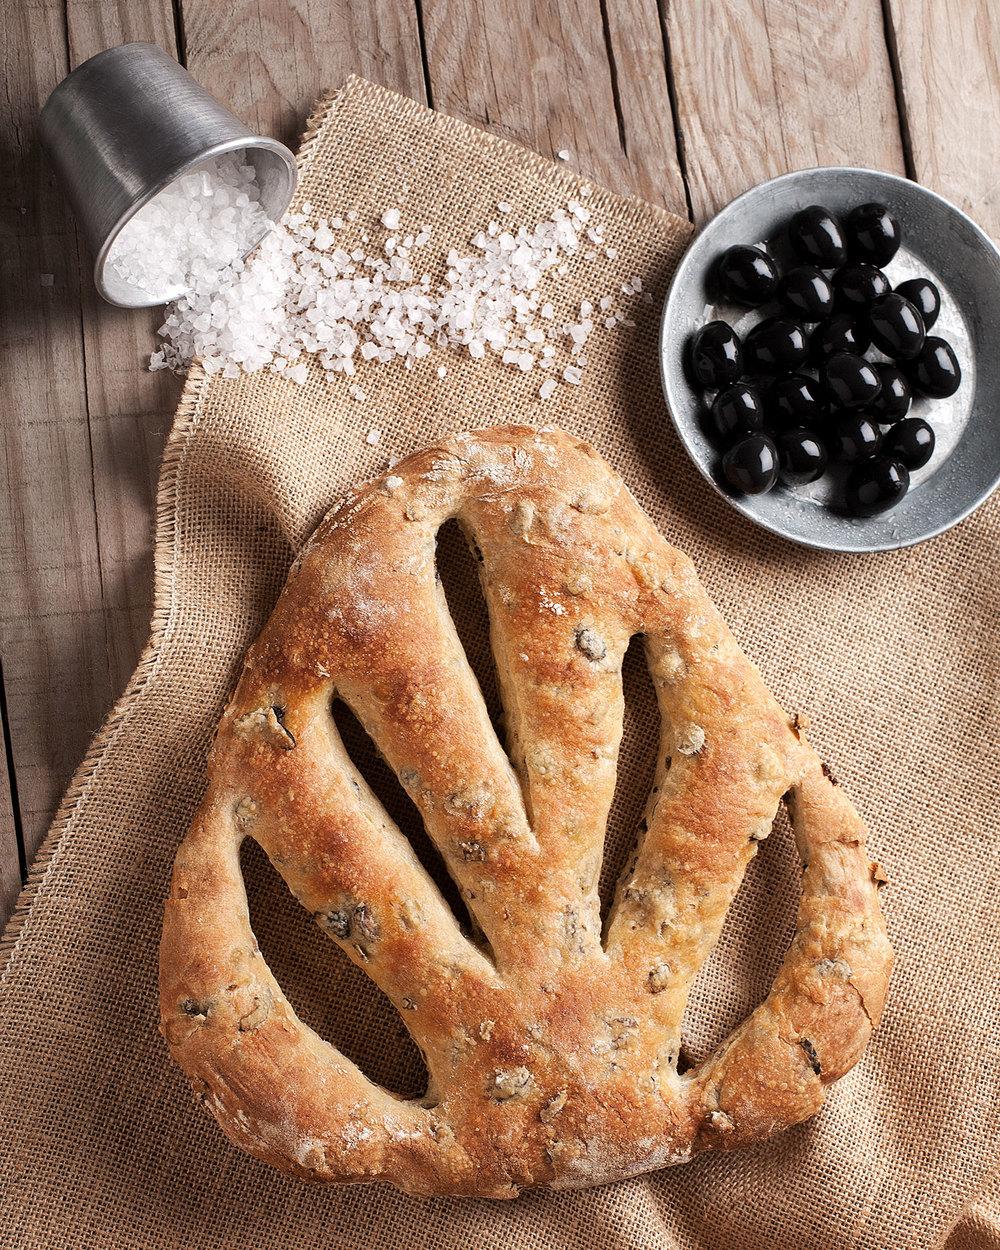 corina-landa-food-photography-fotografia-gastronomica-48.jpg